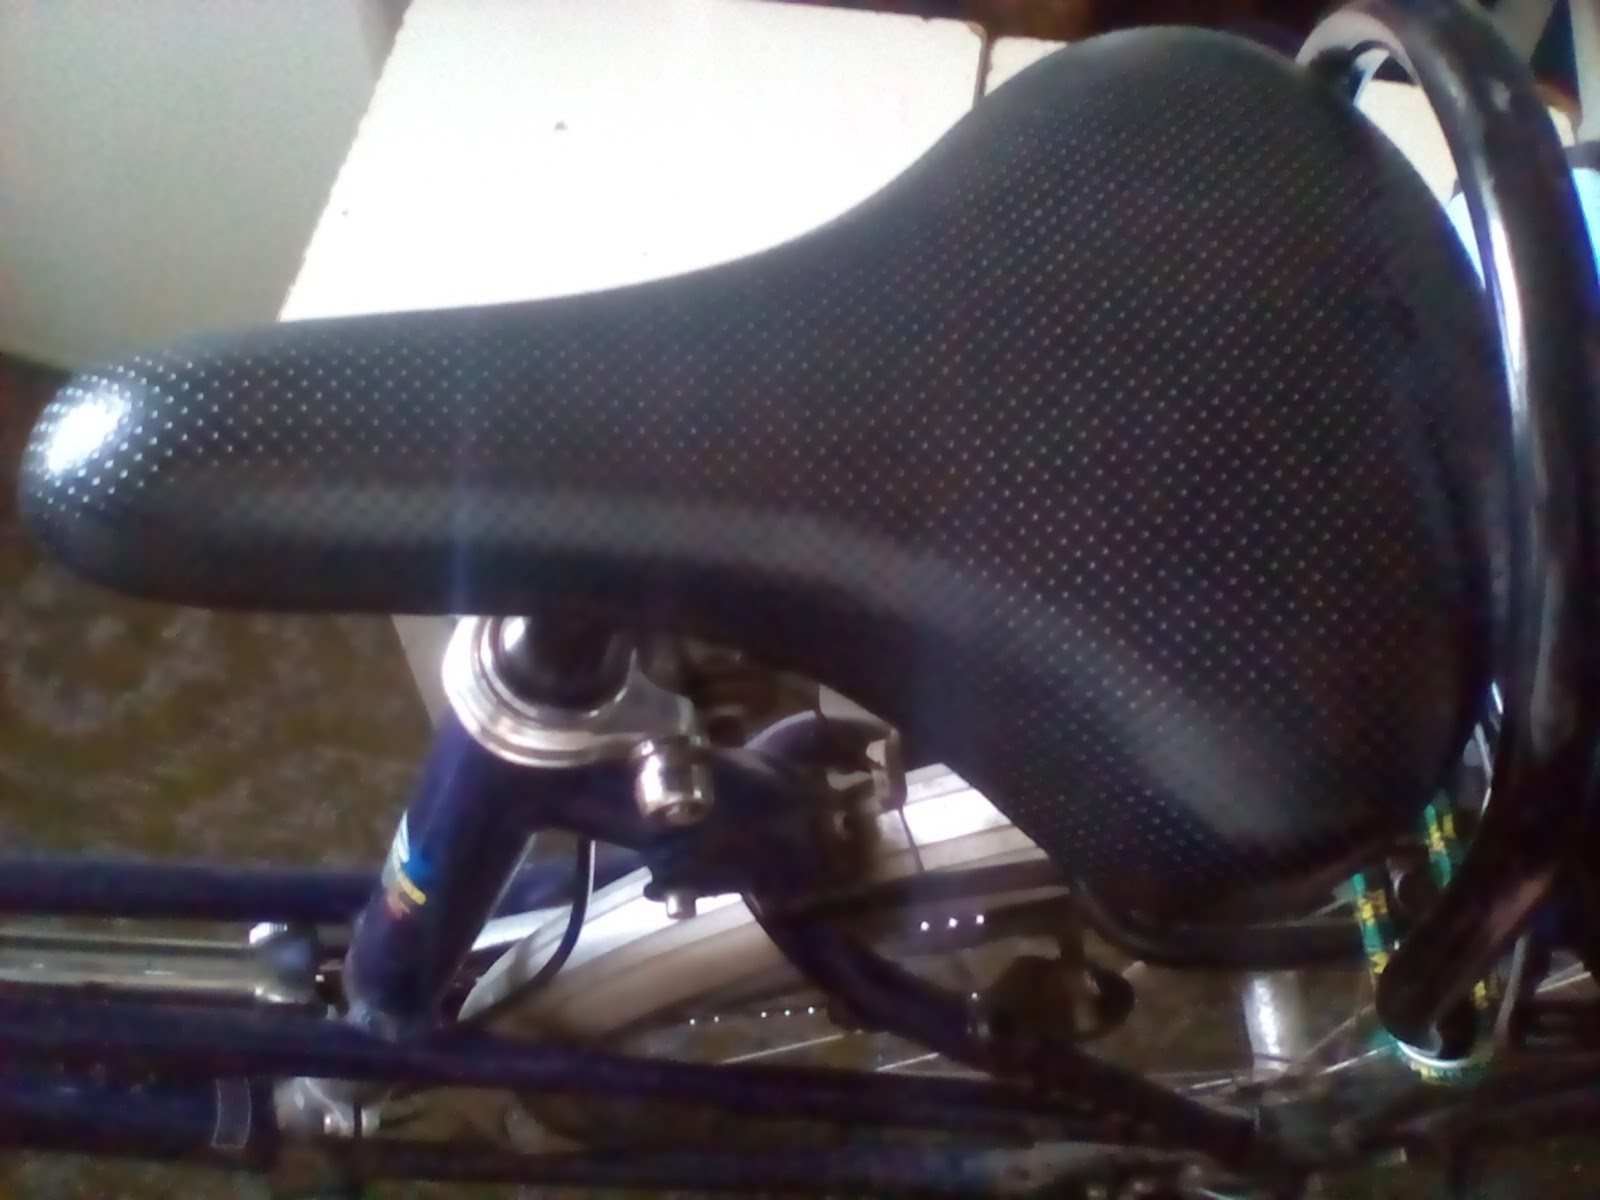 Секс на седле велосипеда 24 фотография